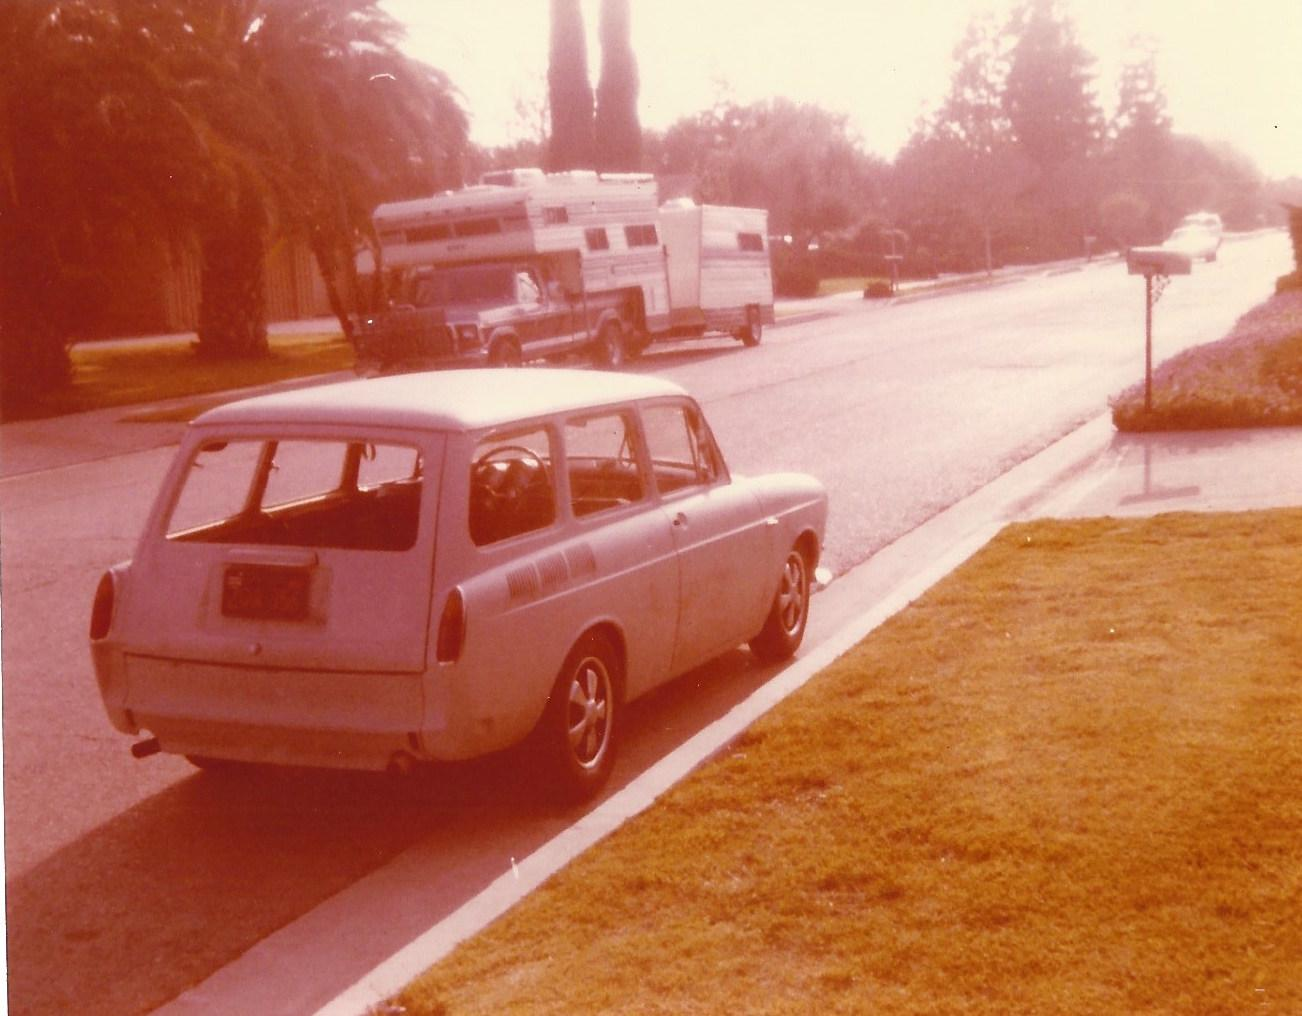 1969 Squareback - Buick V6 Power